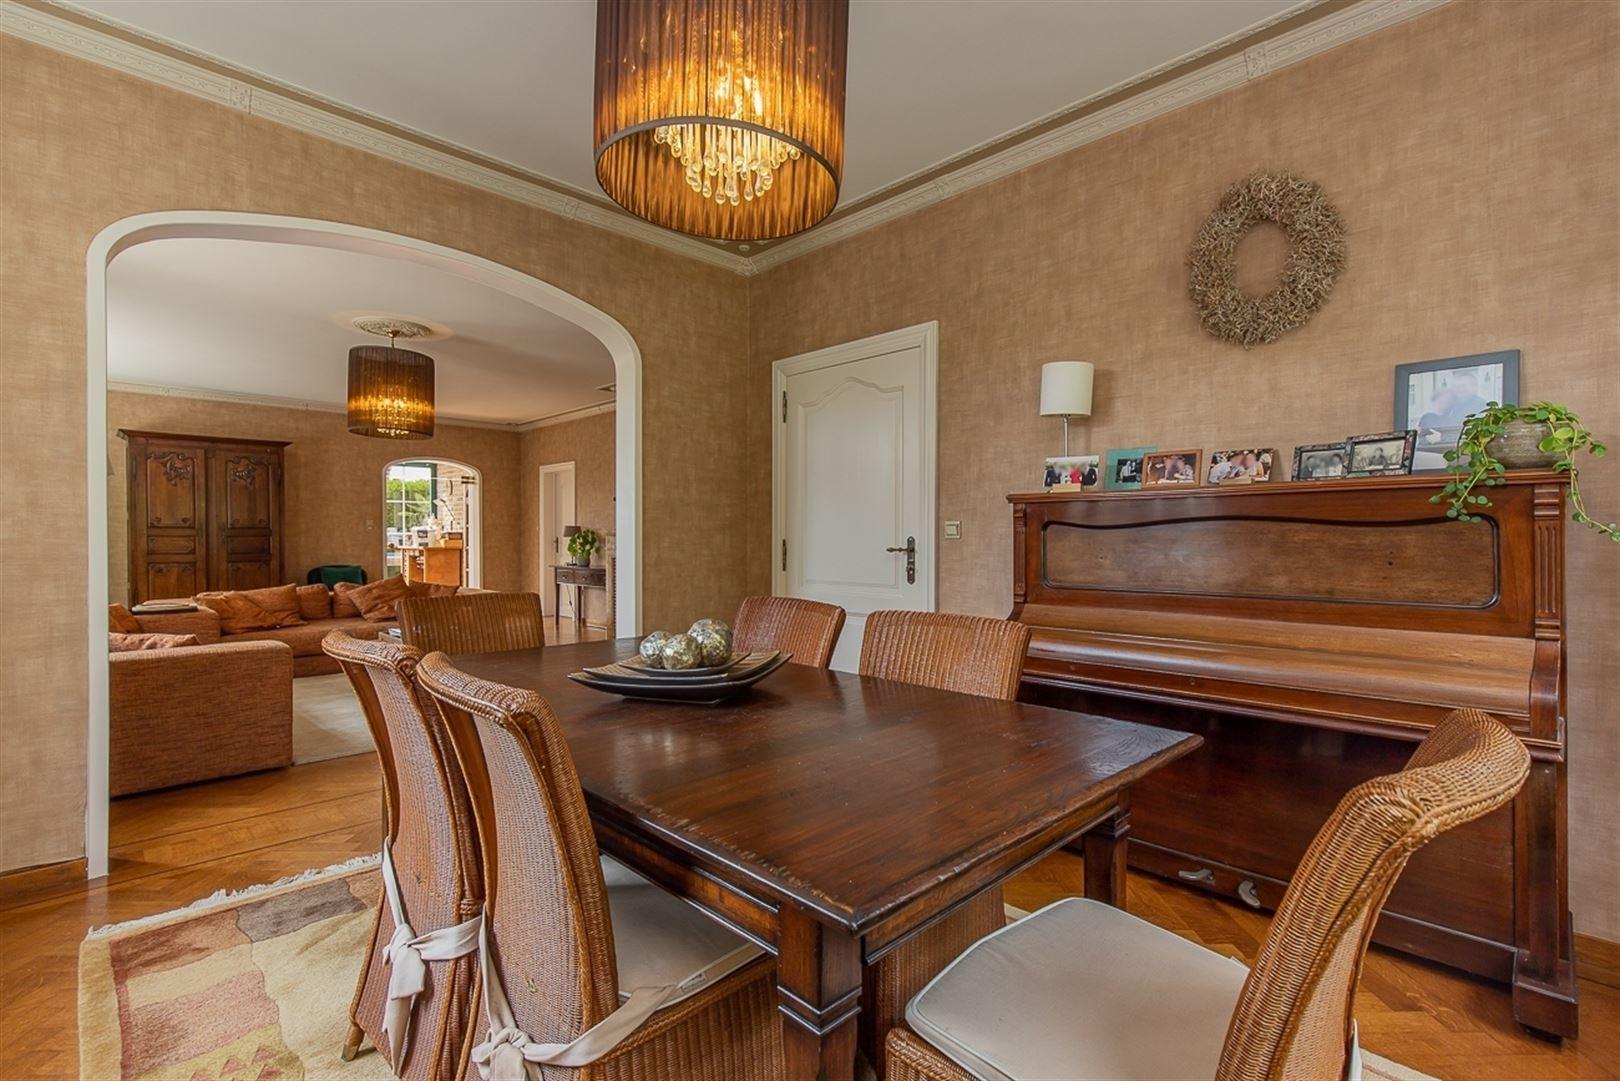 Foto 10 : Woning te 9280 LEBBEKE (België) - Prijs € 469.000